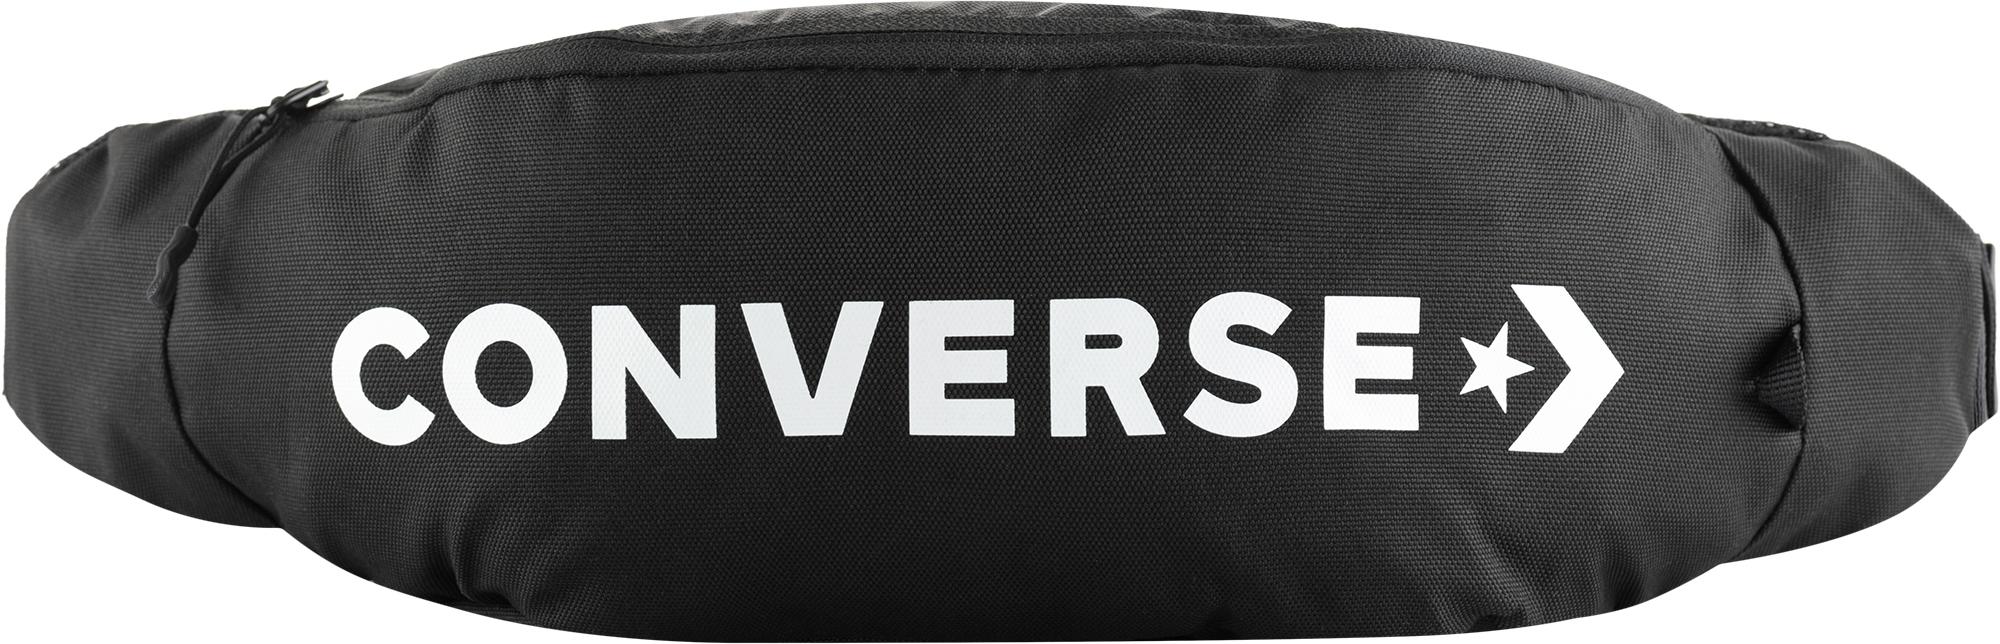 Converse Сумка для мальчиков Converse Can Wordmark